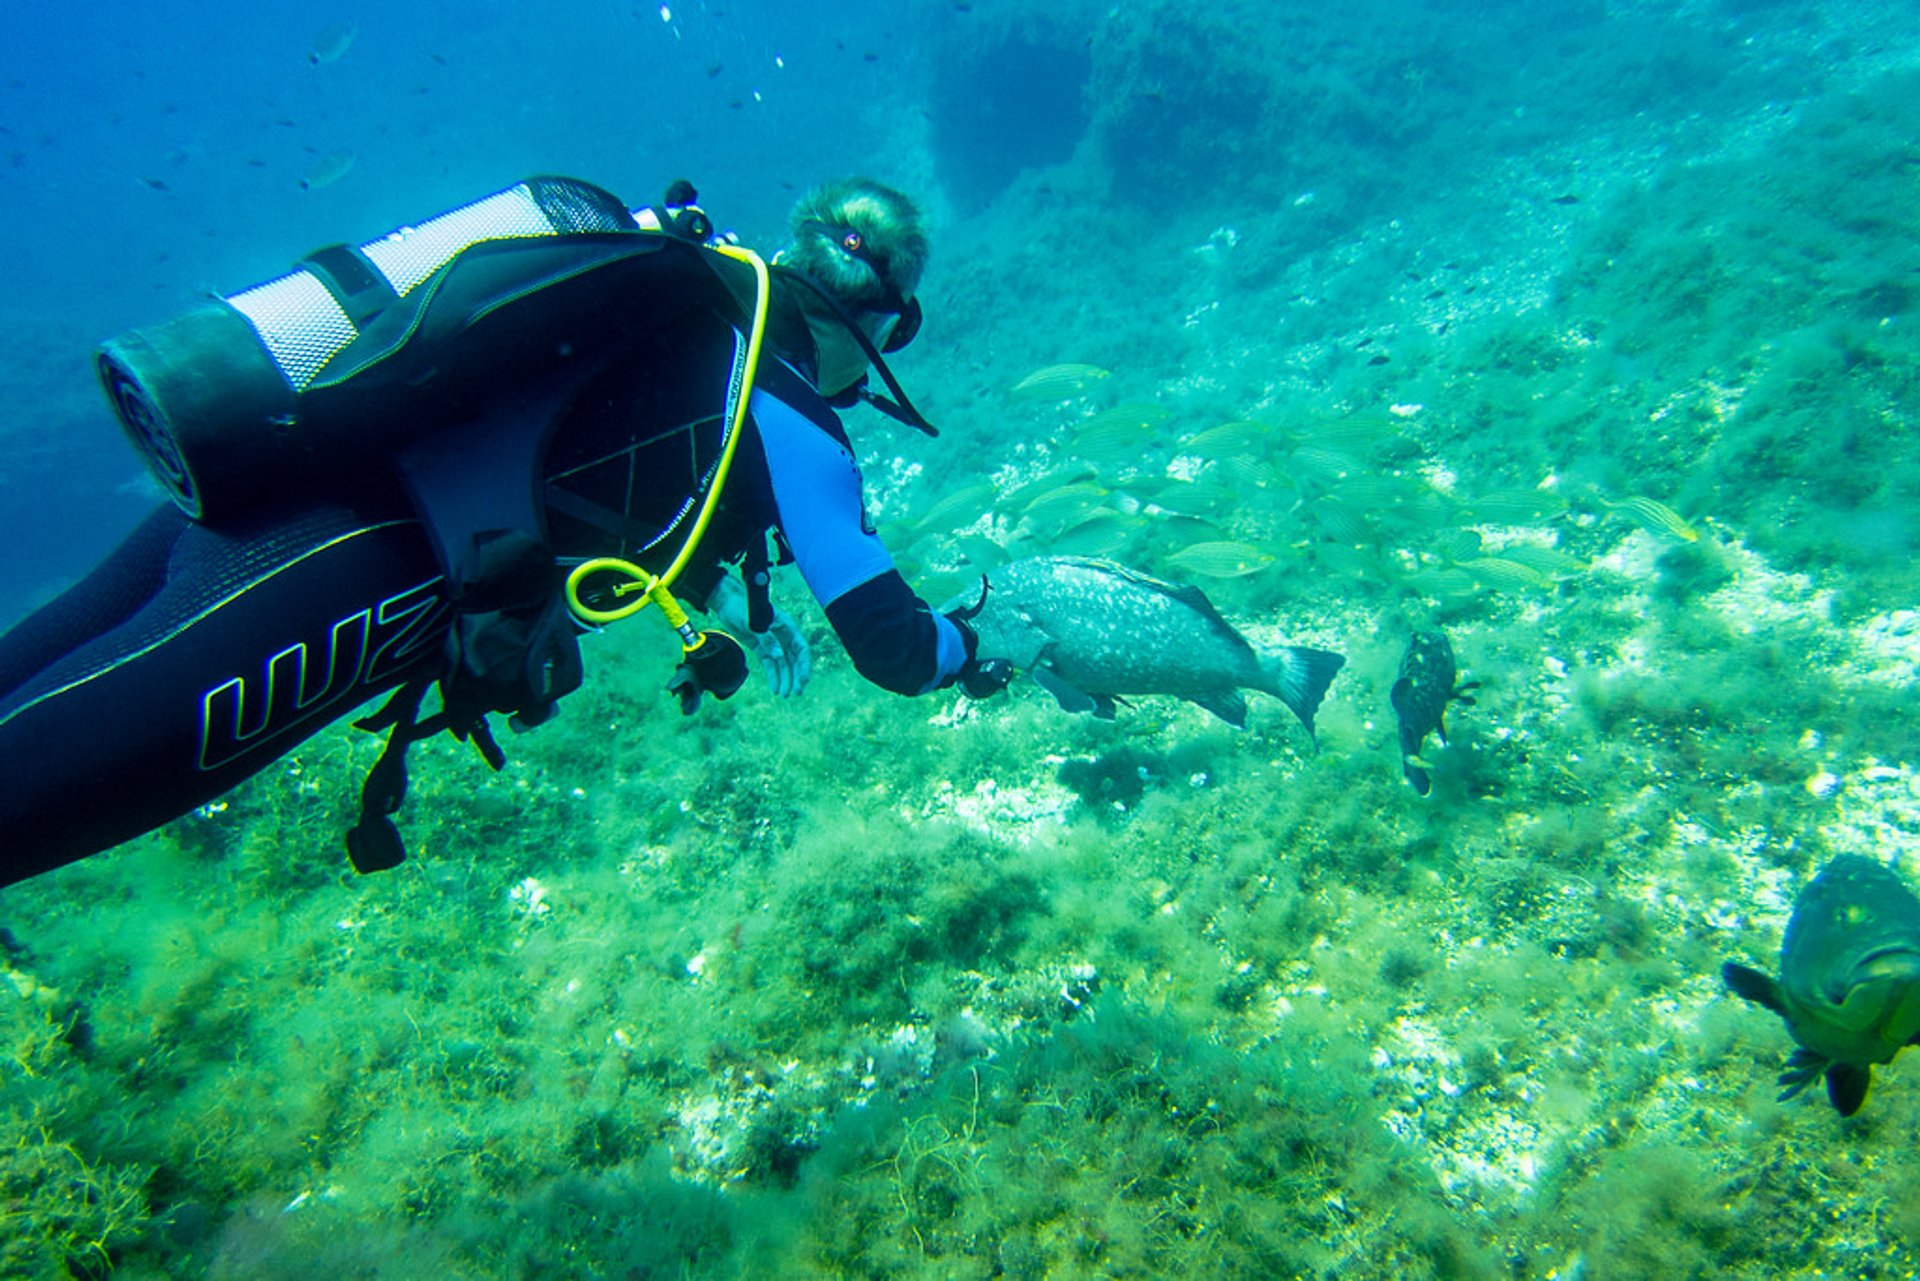 Scuba Diving in Mallorca in Mallorca 2019 - Best Time